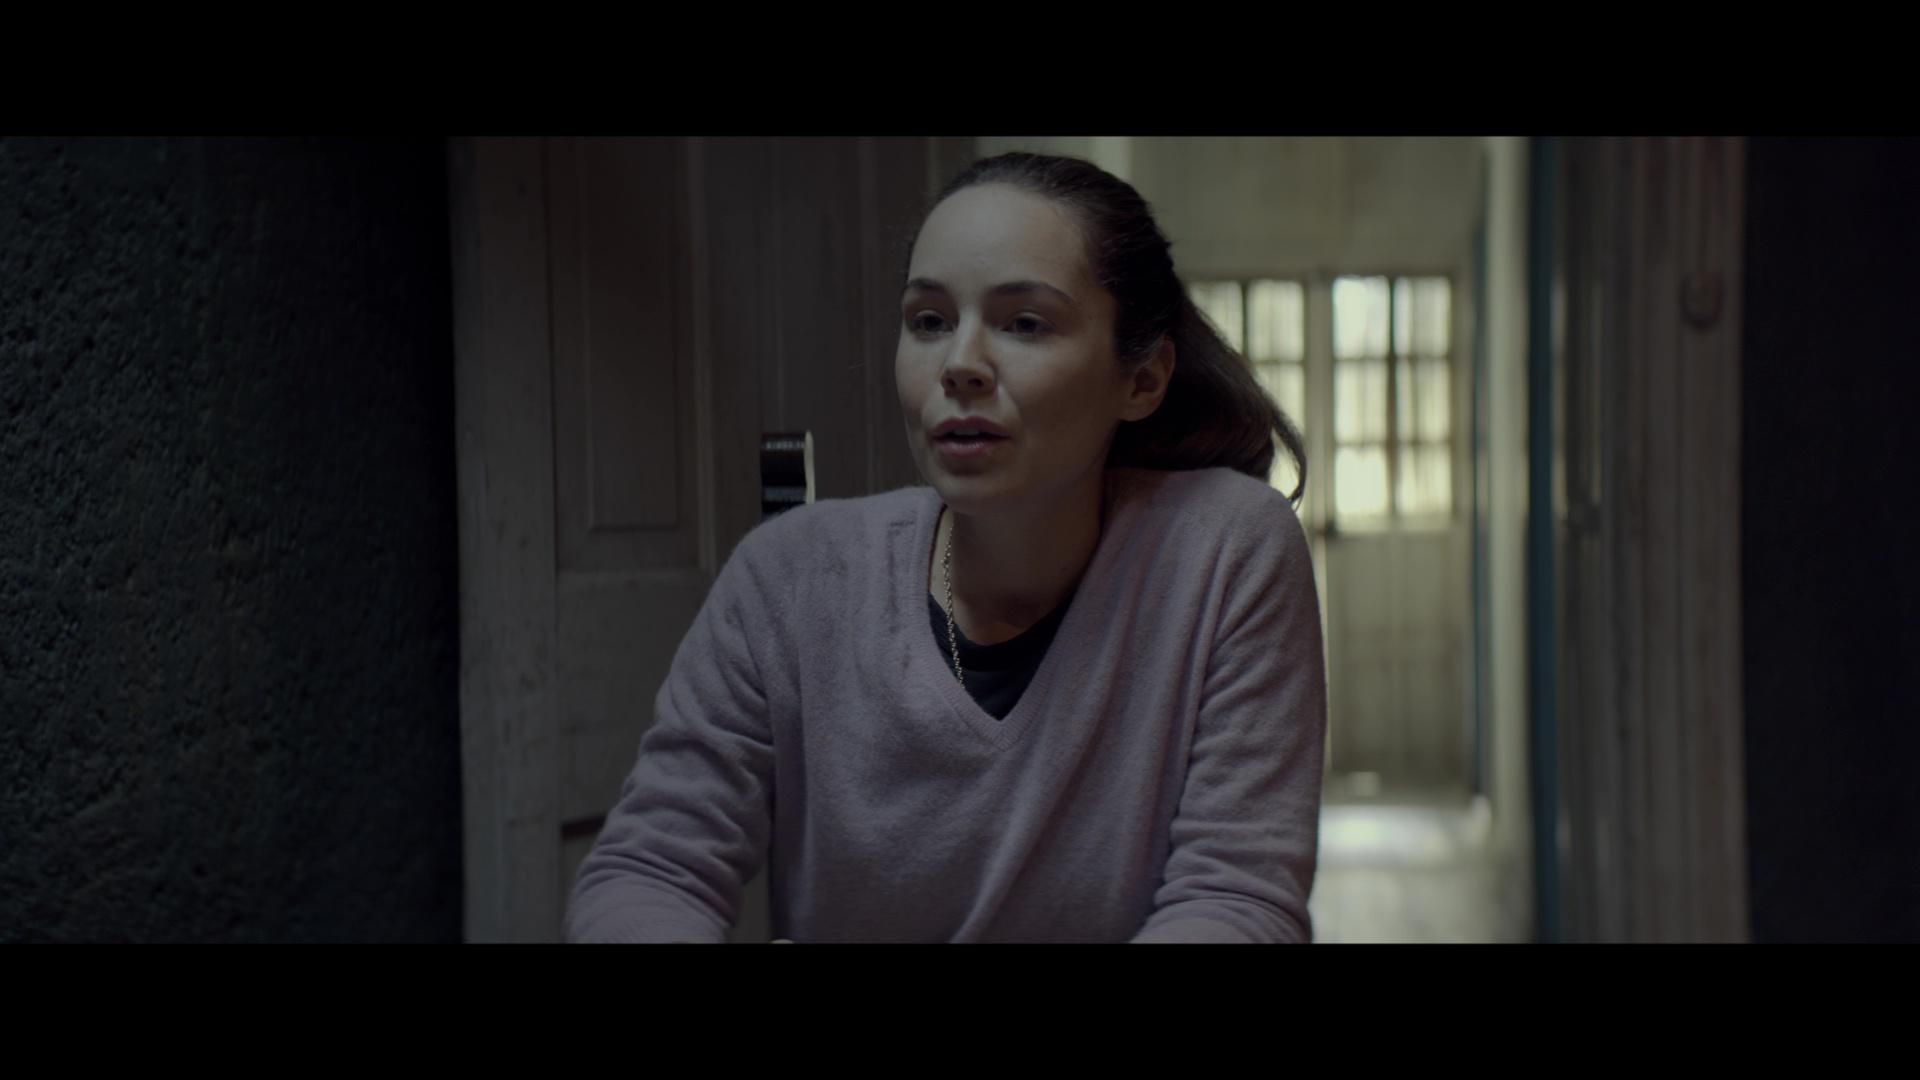 El exorcismo de Carmen Farías (2021) 1080p Remux Latino